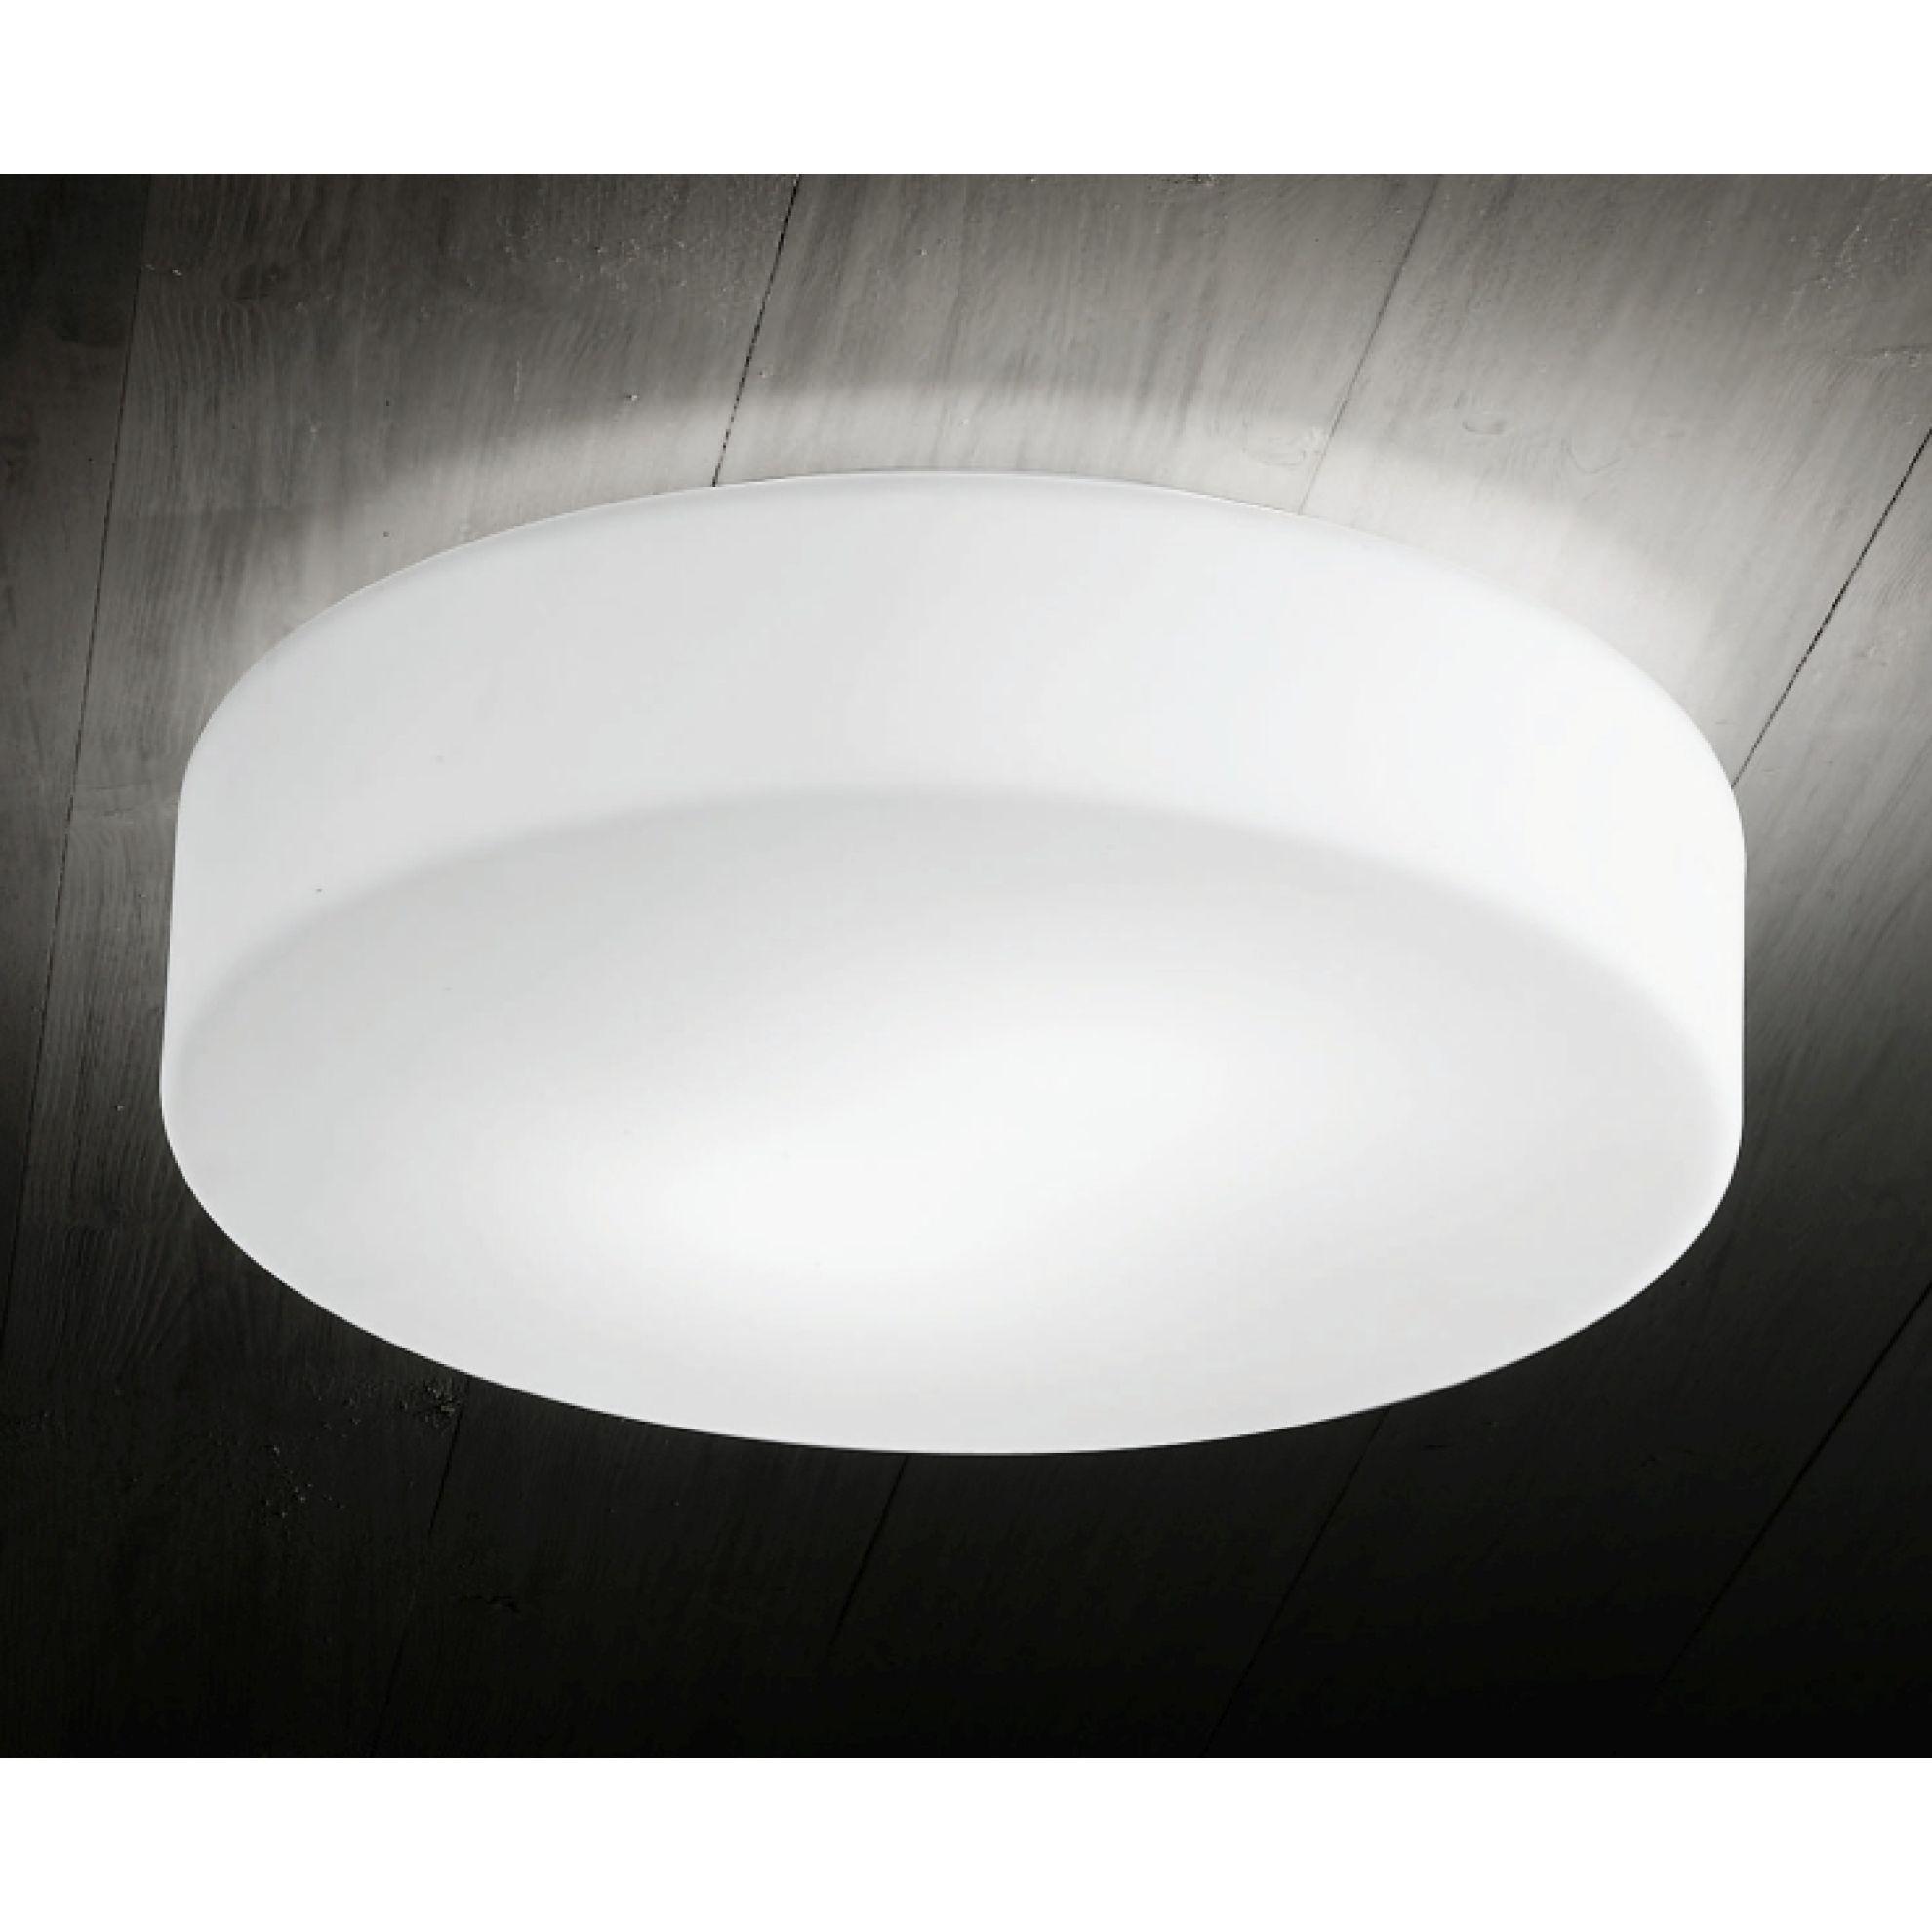 Graff led leuchte fabas luce for Wand deckenleuchte led